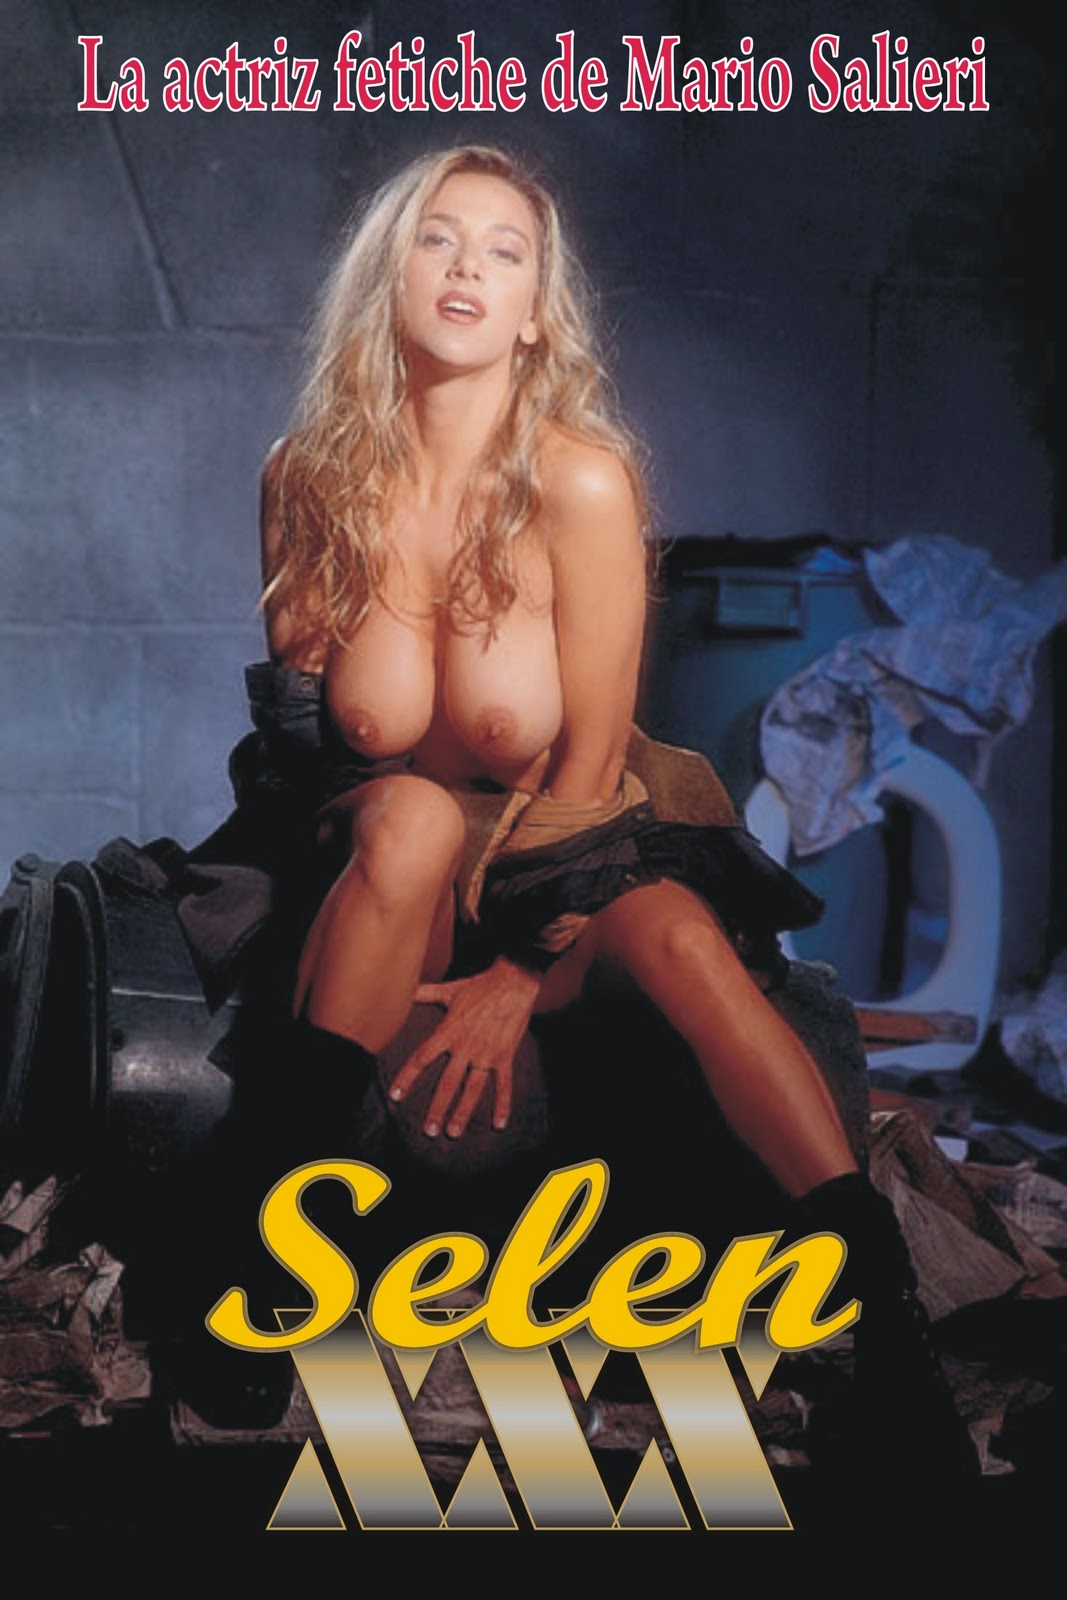 Showing Xxx Images For Orgia Di Compleanno Selen Xxx Www Fuckpix Club